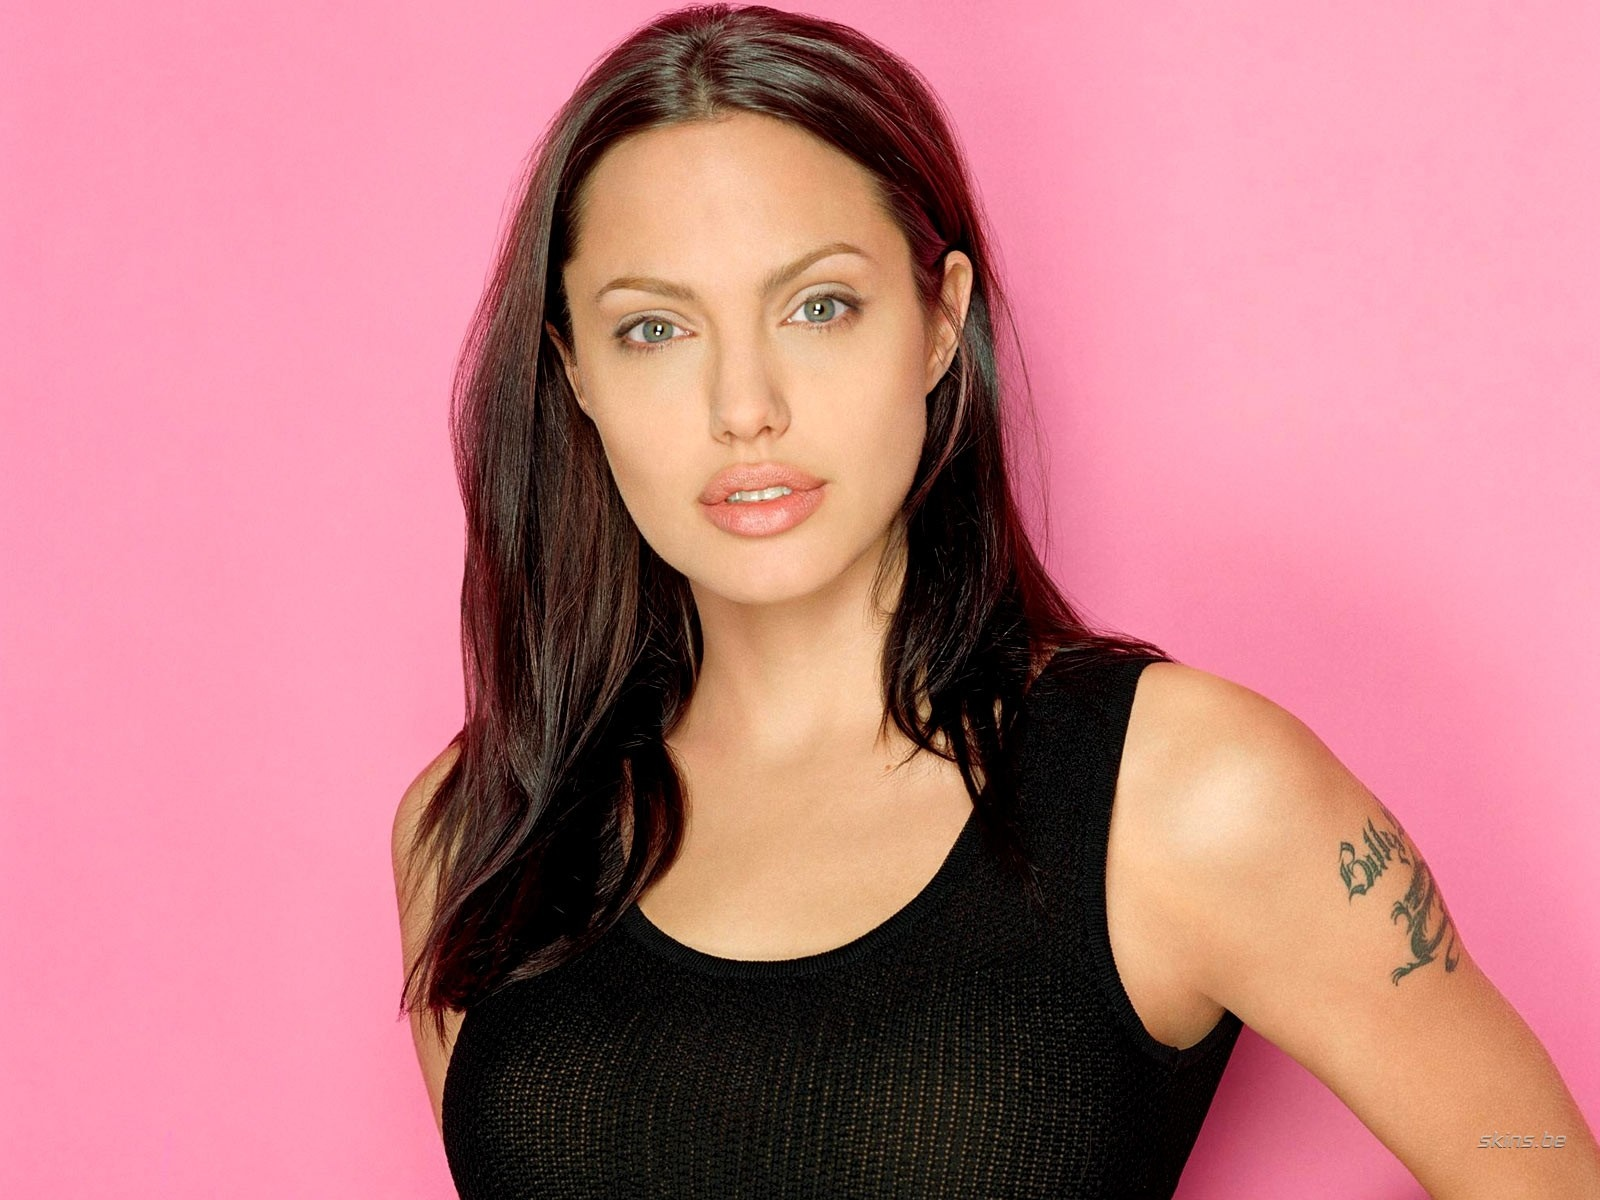 Angelina jolie ver foto chica desnuda gratis 45